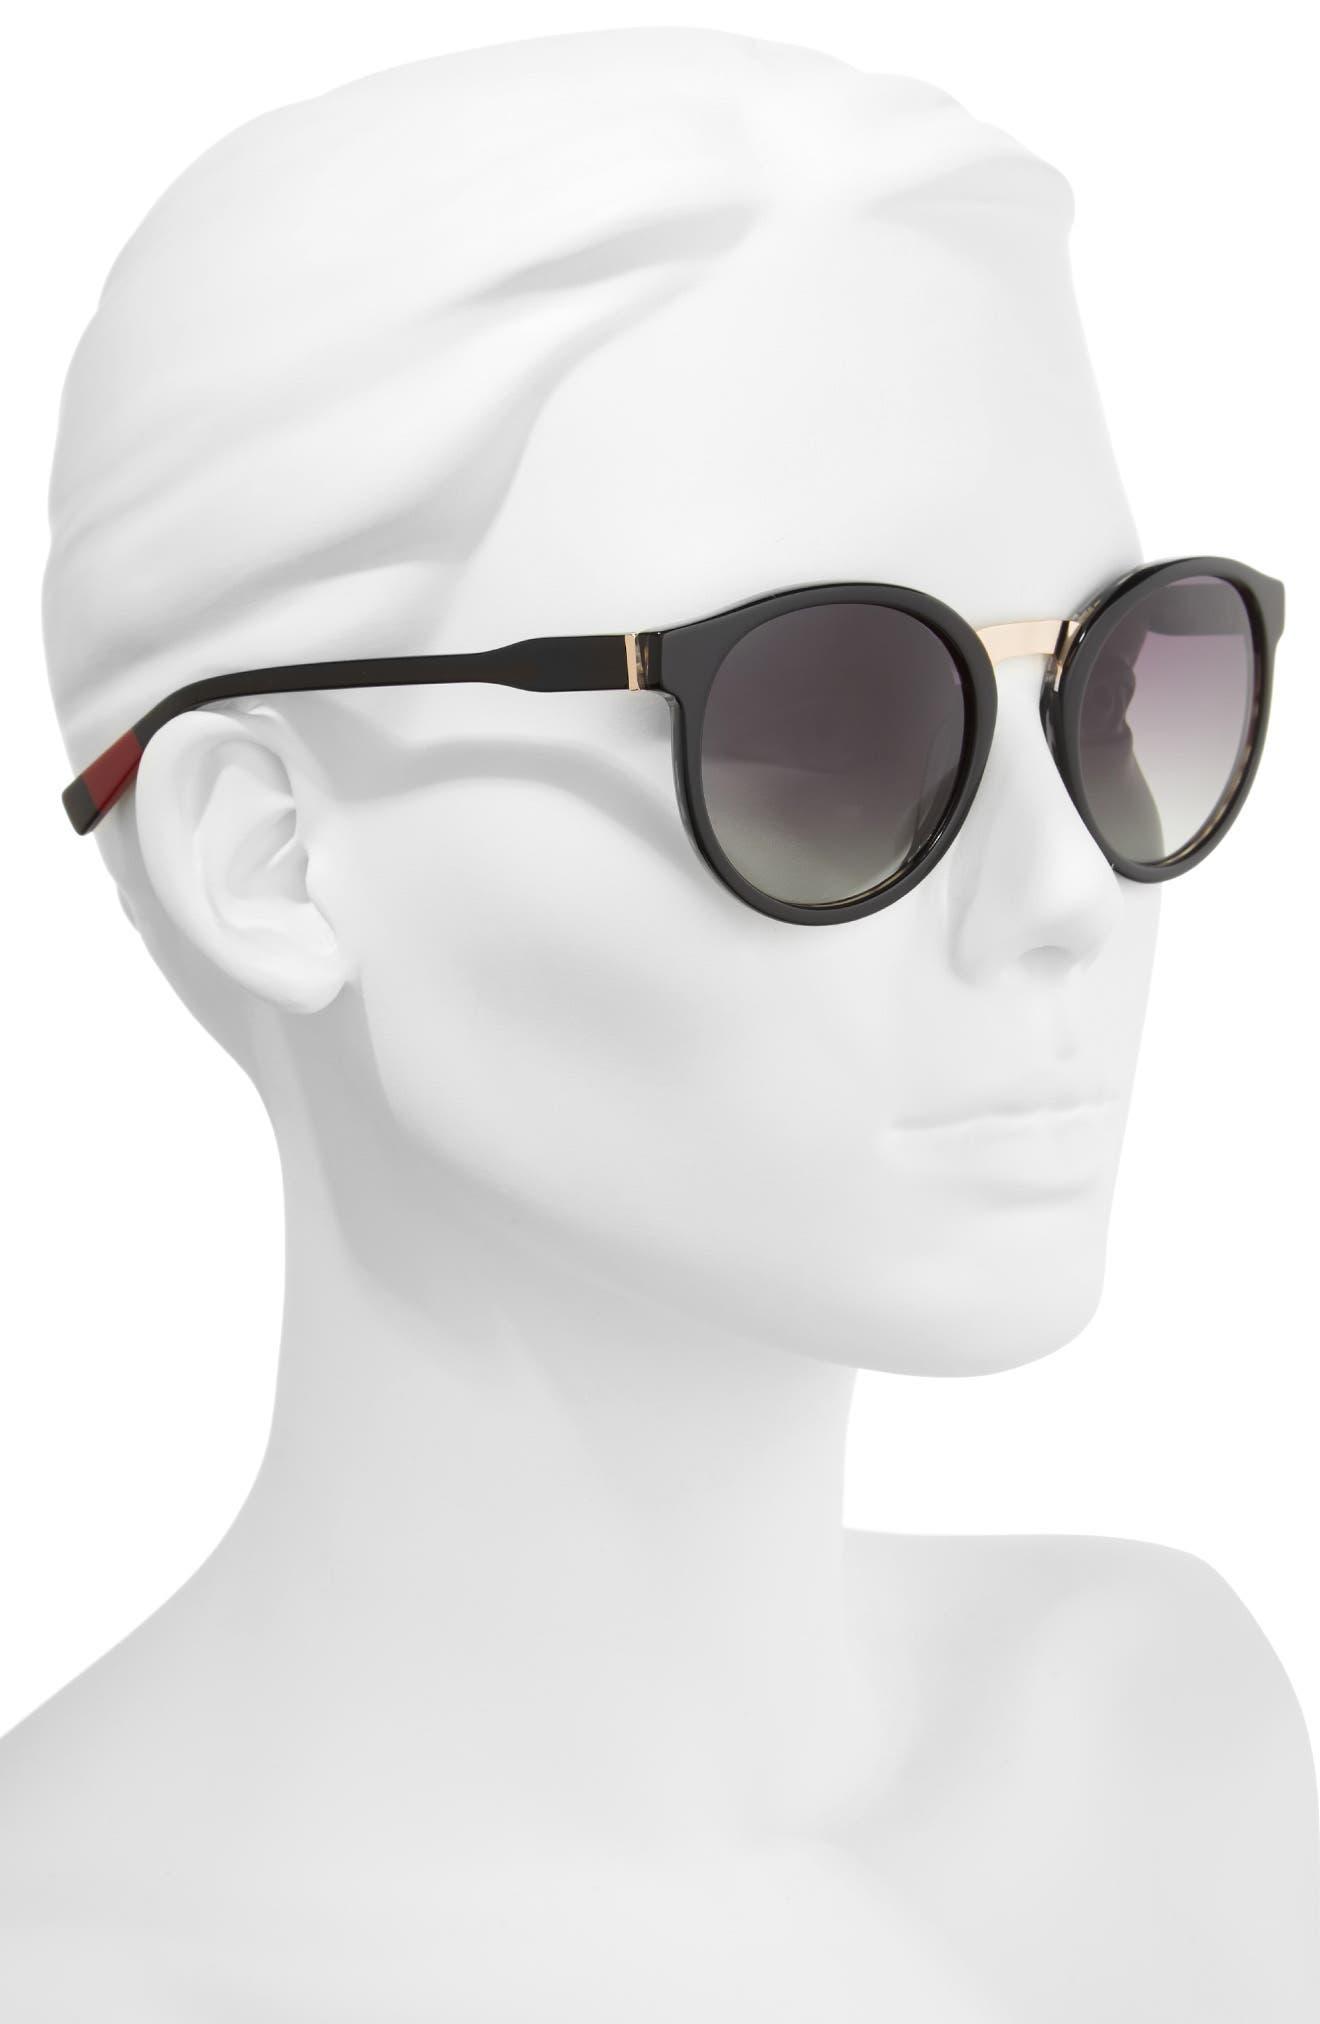 53mm Round Sunglasses,                             Alternate thumbnail 2, color,                             001